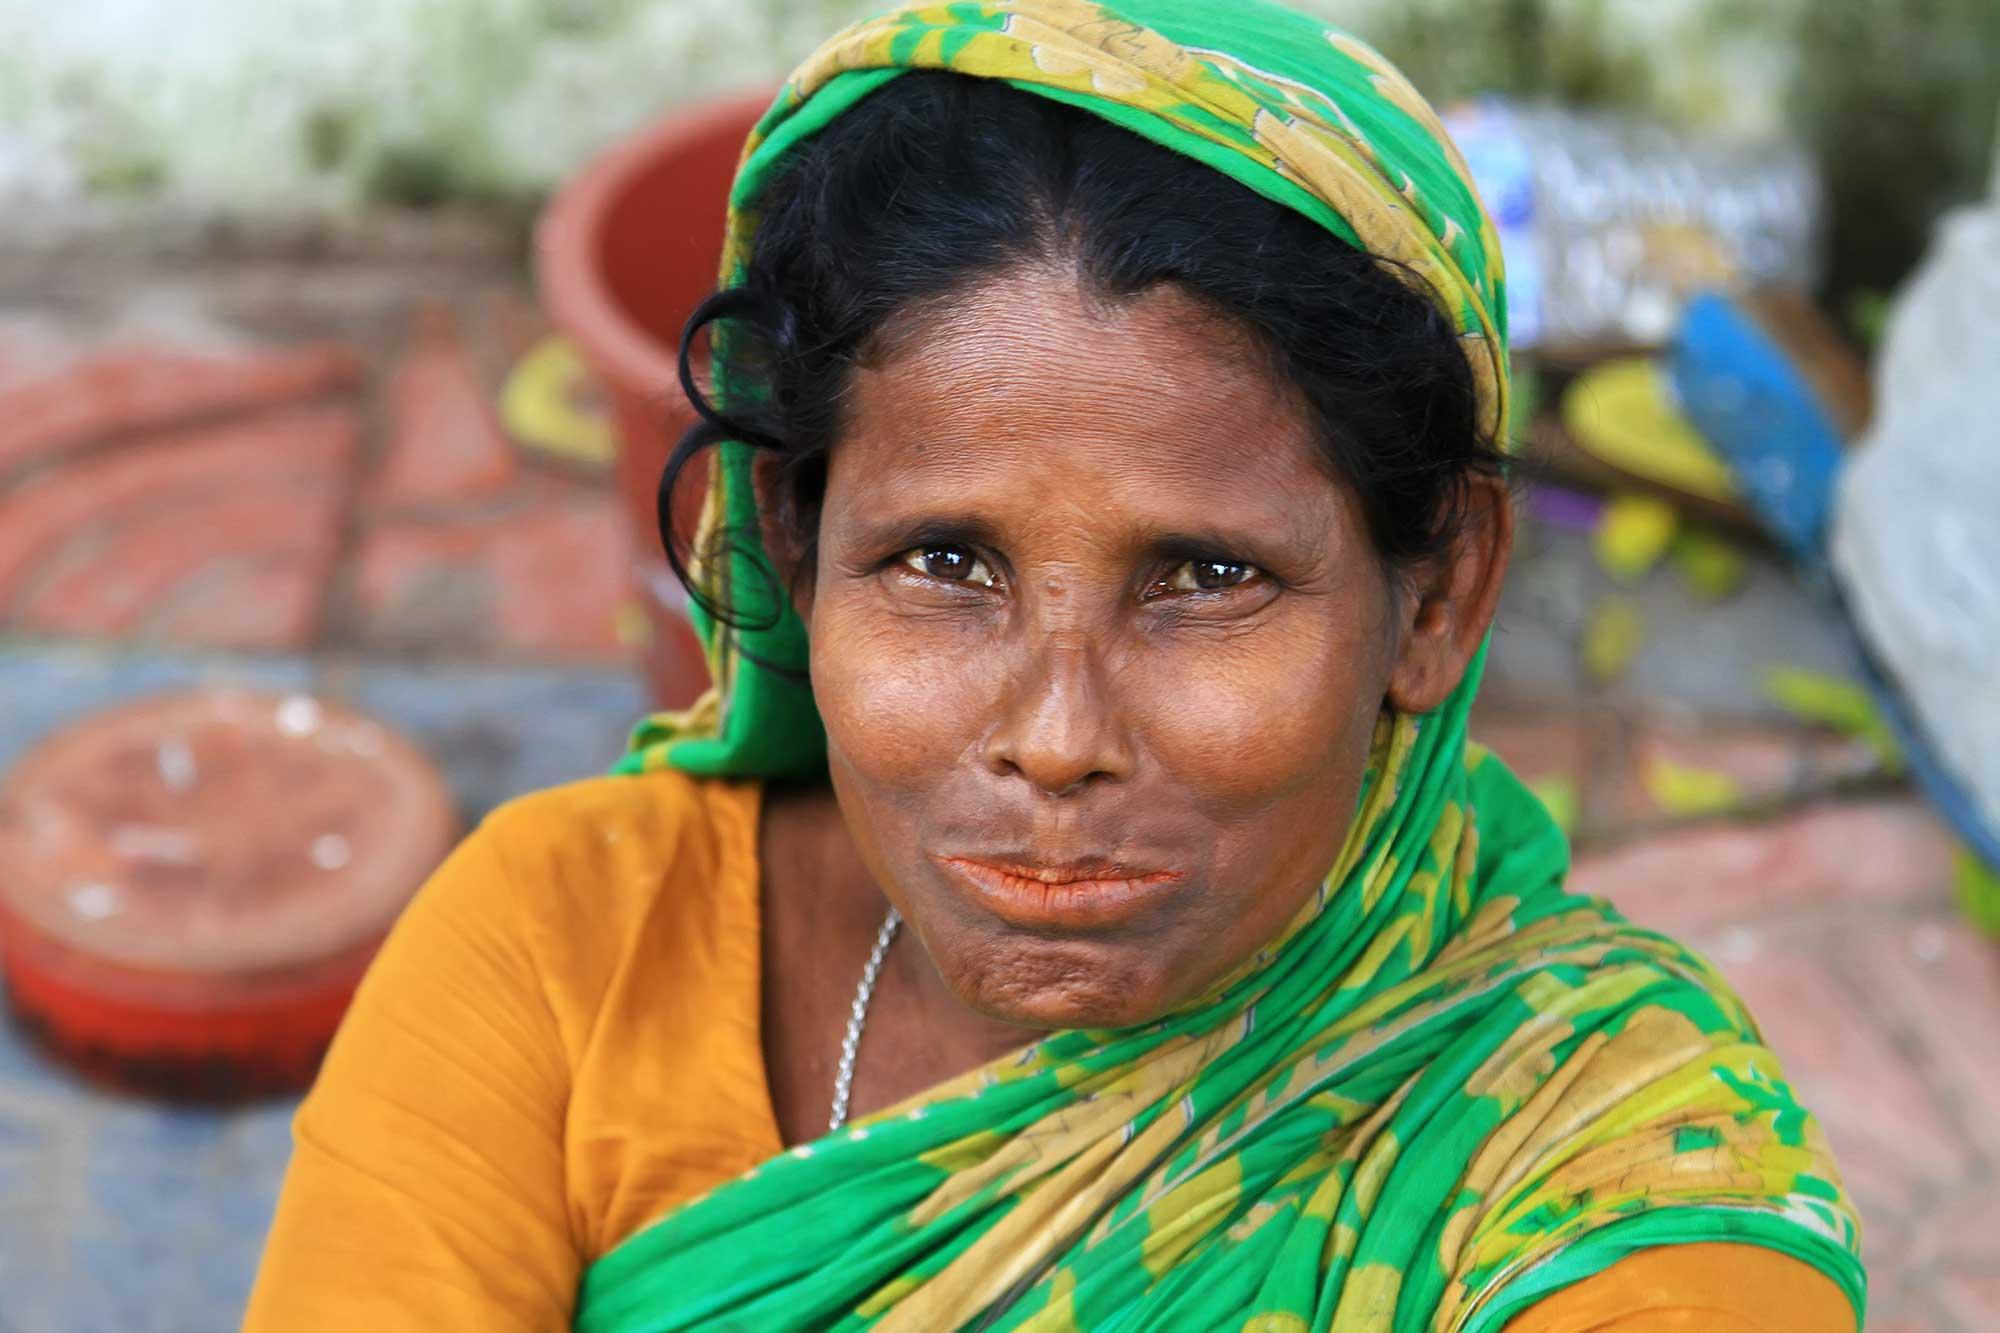 portrait-woman-streets-dhaka-bangladesh